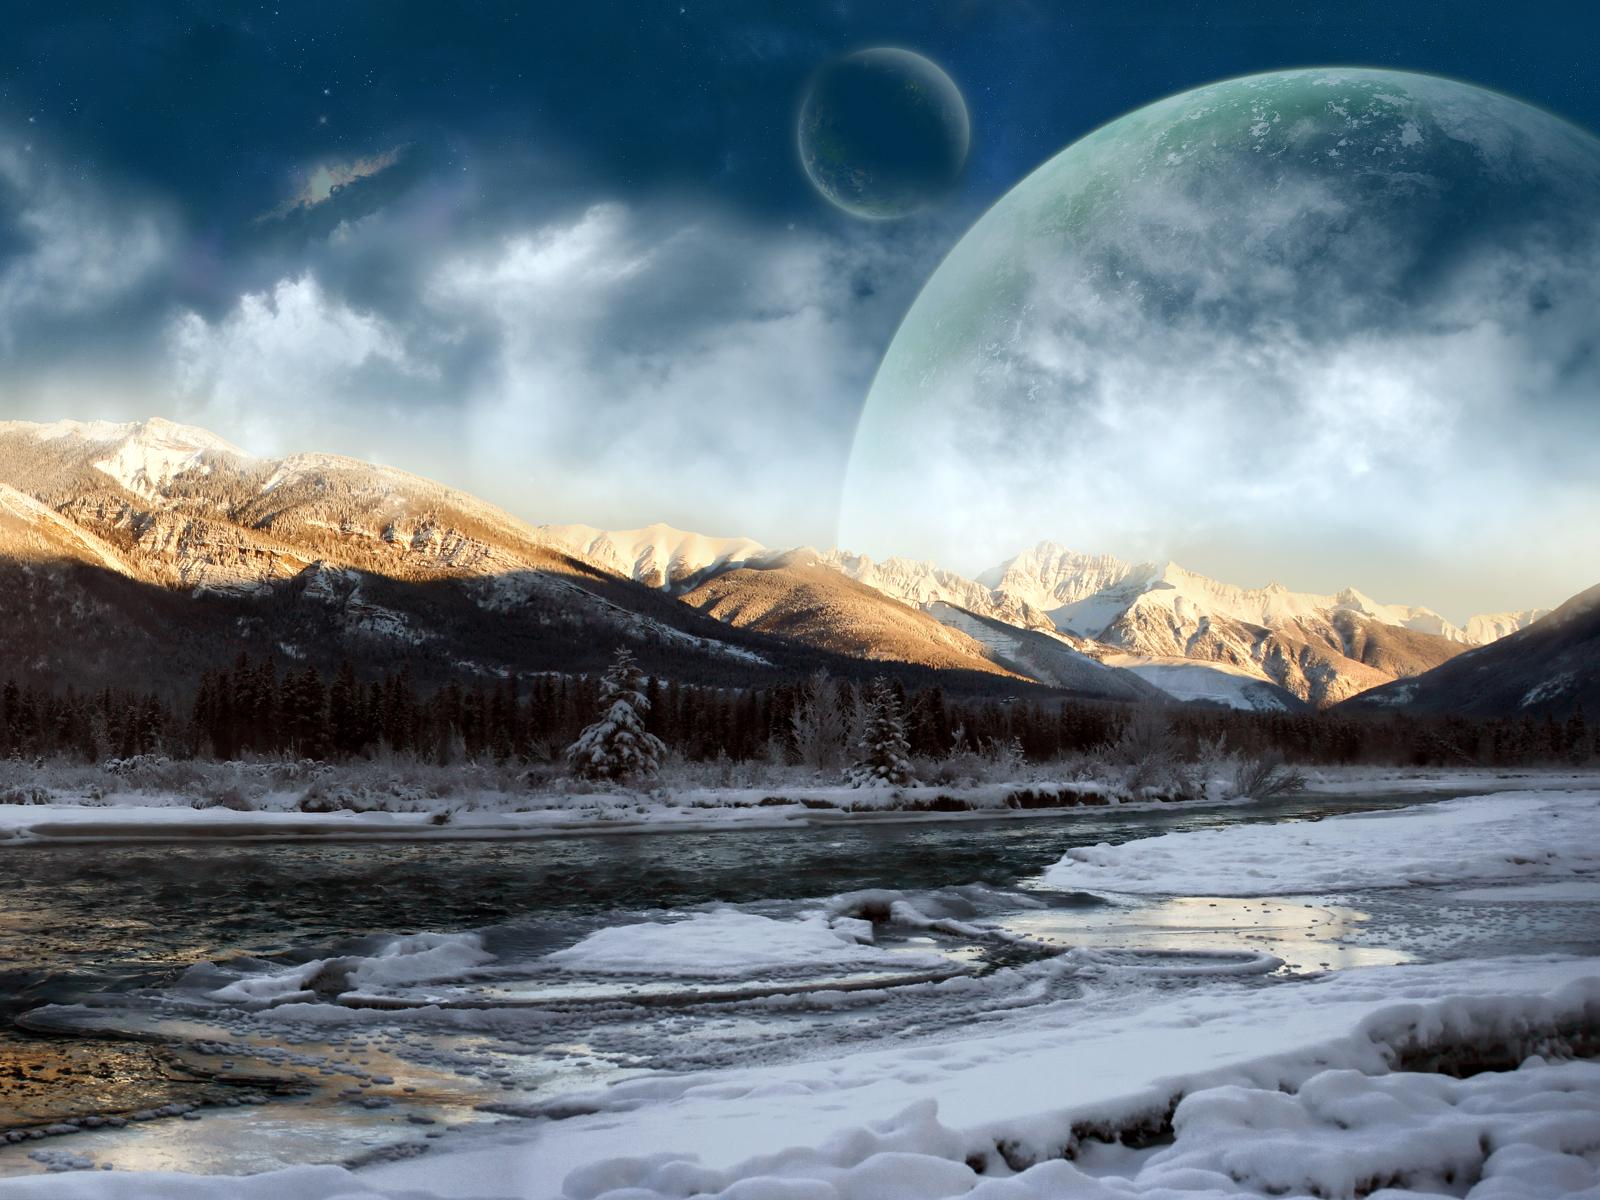 Moon Mountains Laptop Wallpaper Wallpaper Desktop HD Download 1600x1200